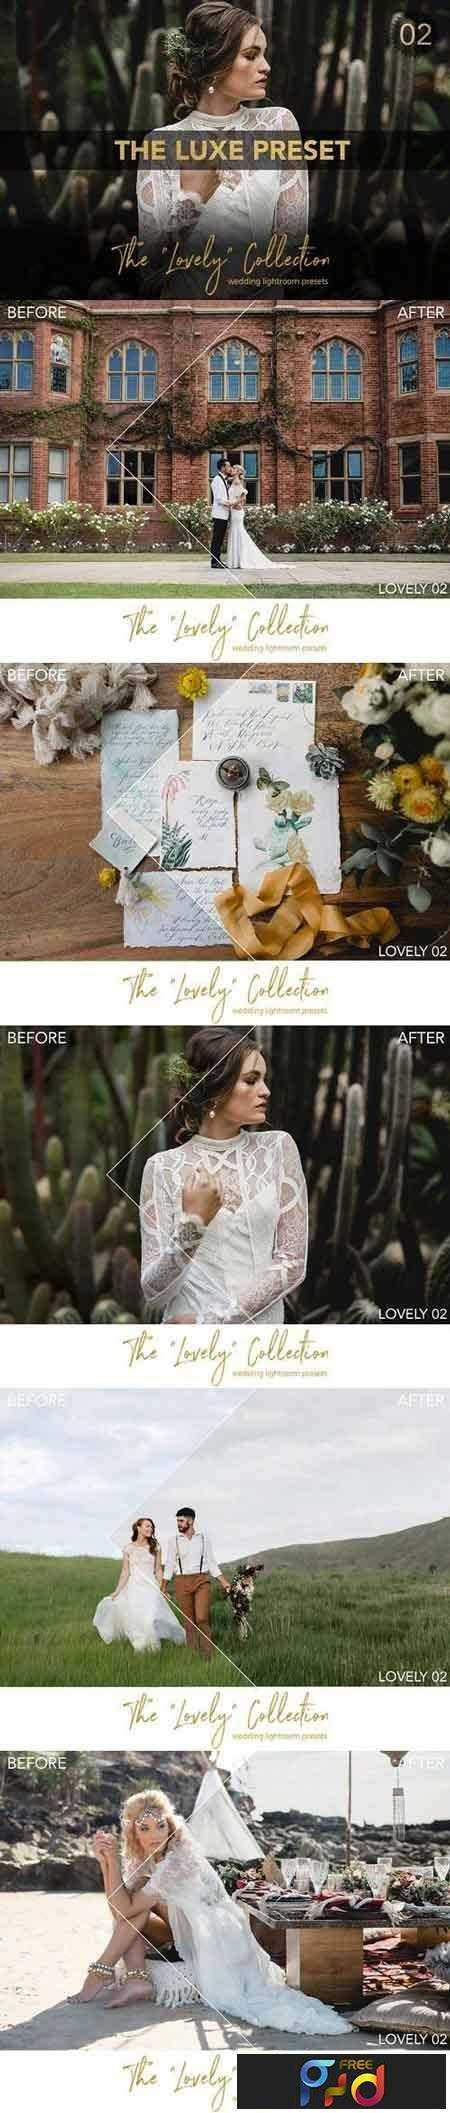 FreePsdVn.com_1703275_LIGHTROOM_fineart_wedding_pro_lightroom_preset_1454449